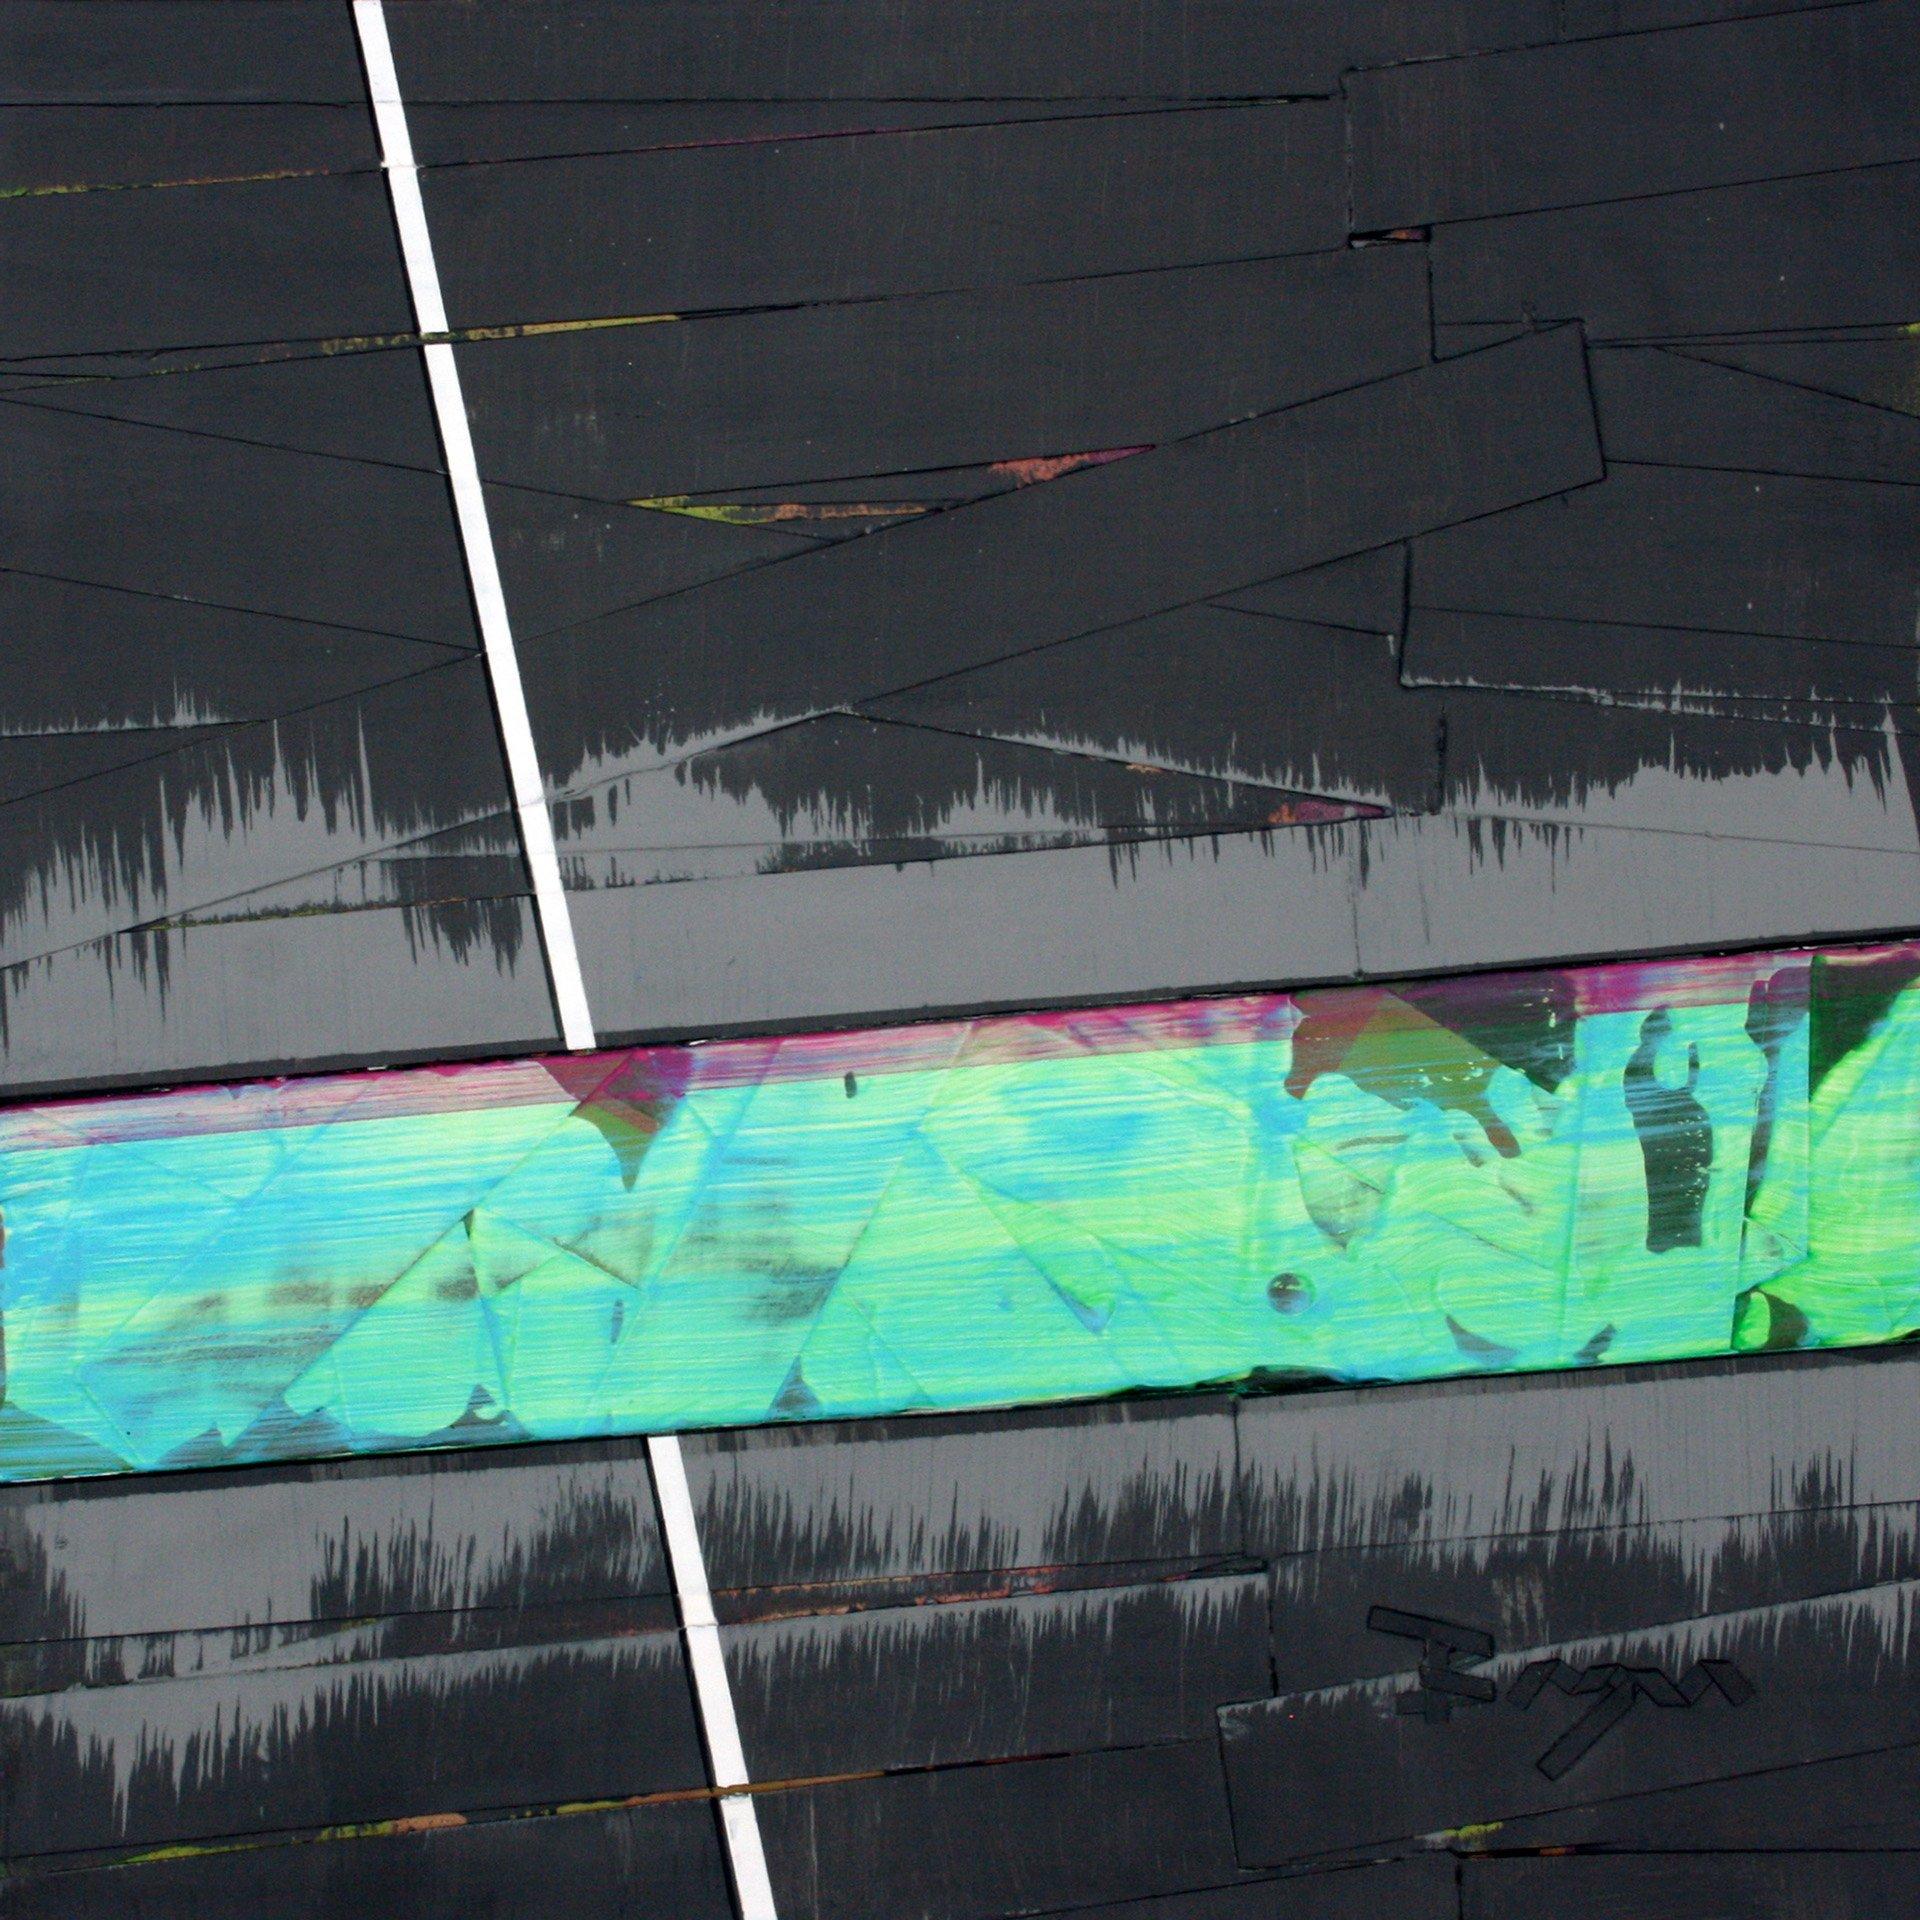 Bryan Boone work of art Folds Series